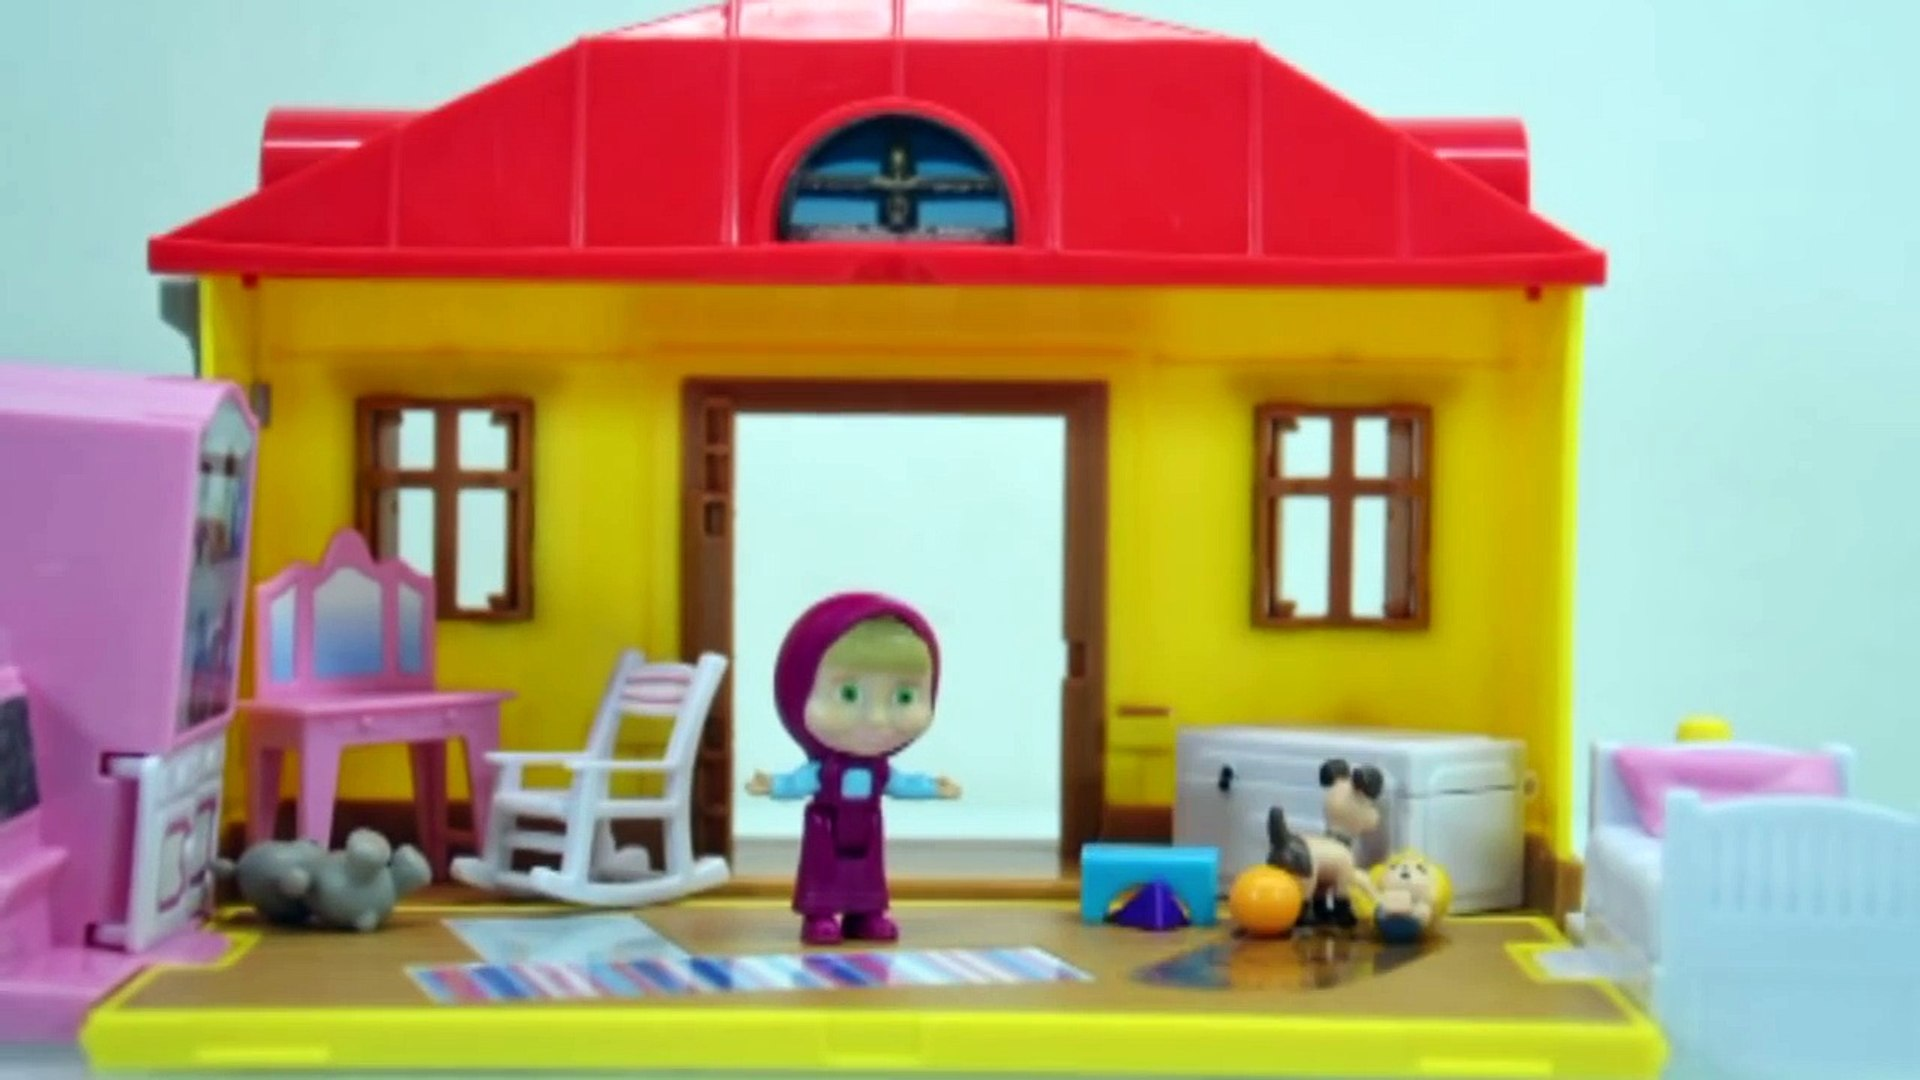 Masha and The Bear Toys stop motion Episode 1 - Супер Маша и собака